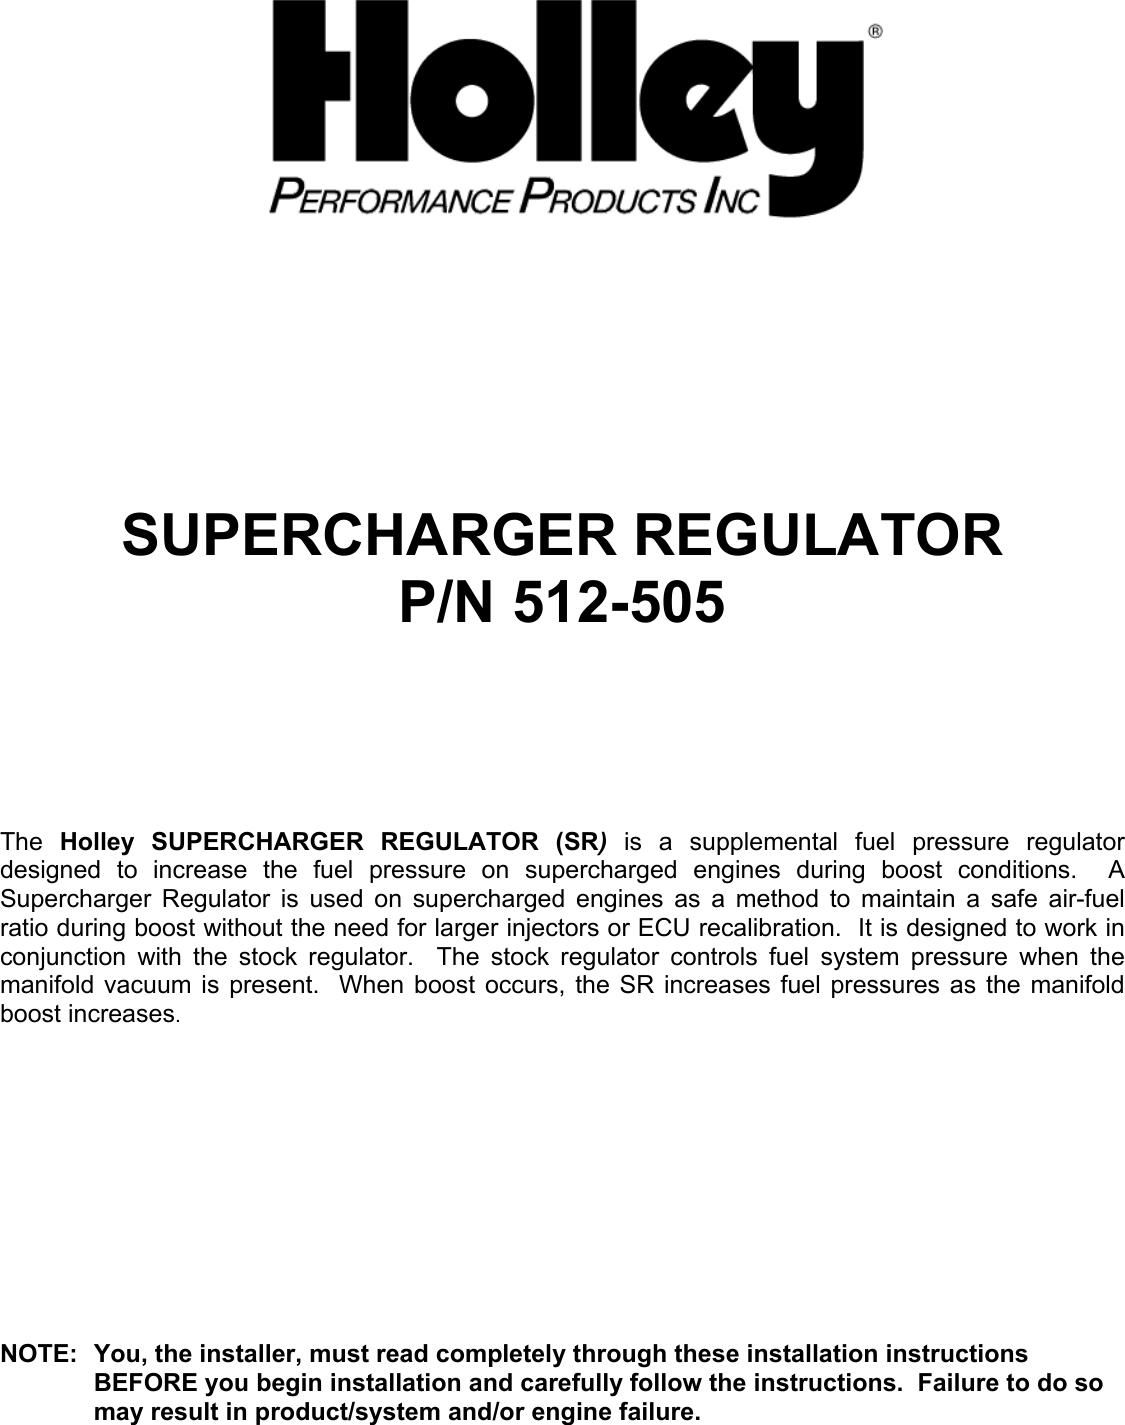 holley p n 512 505 users manual fuel pressure regulator installation rh usermanual wiki holley ddsd 285 user manual holley hp efi user manual